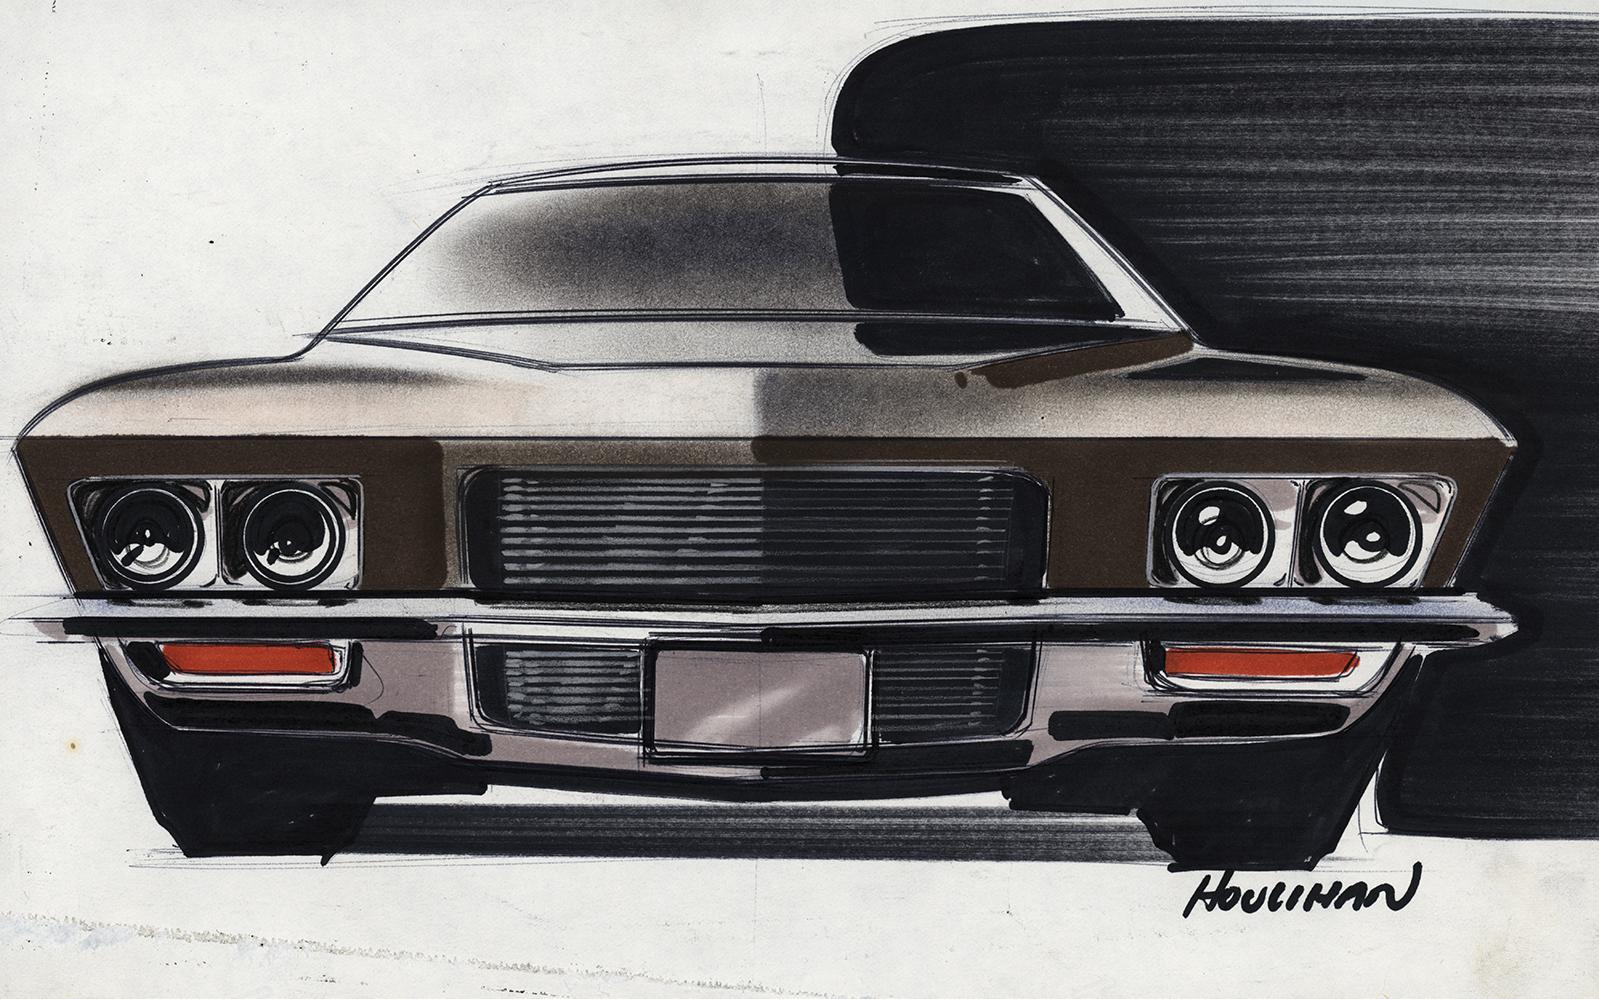 H1000GM Boattail Riv front concept '68.jpg